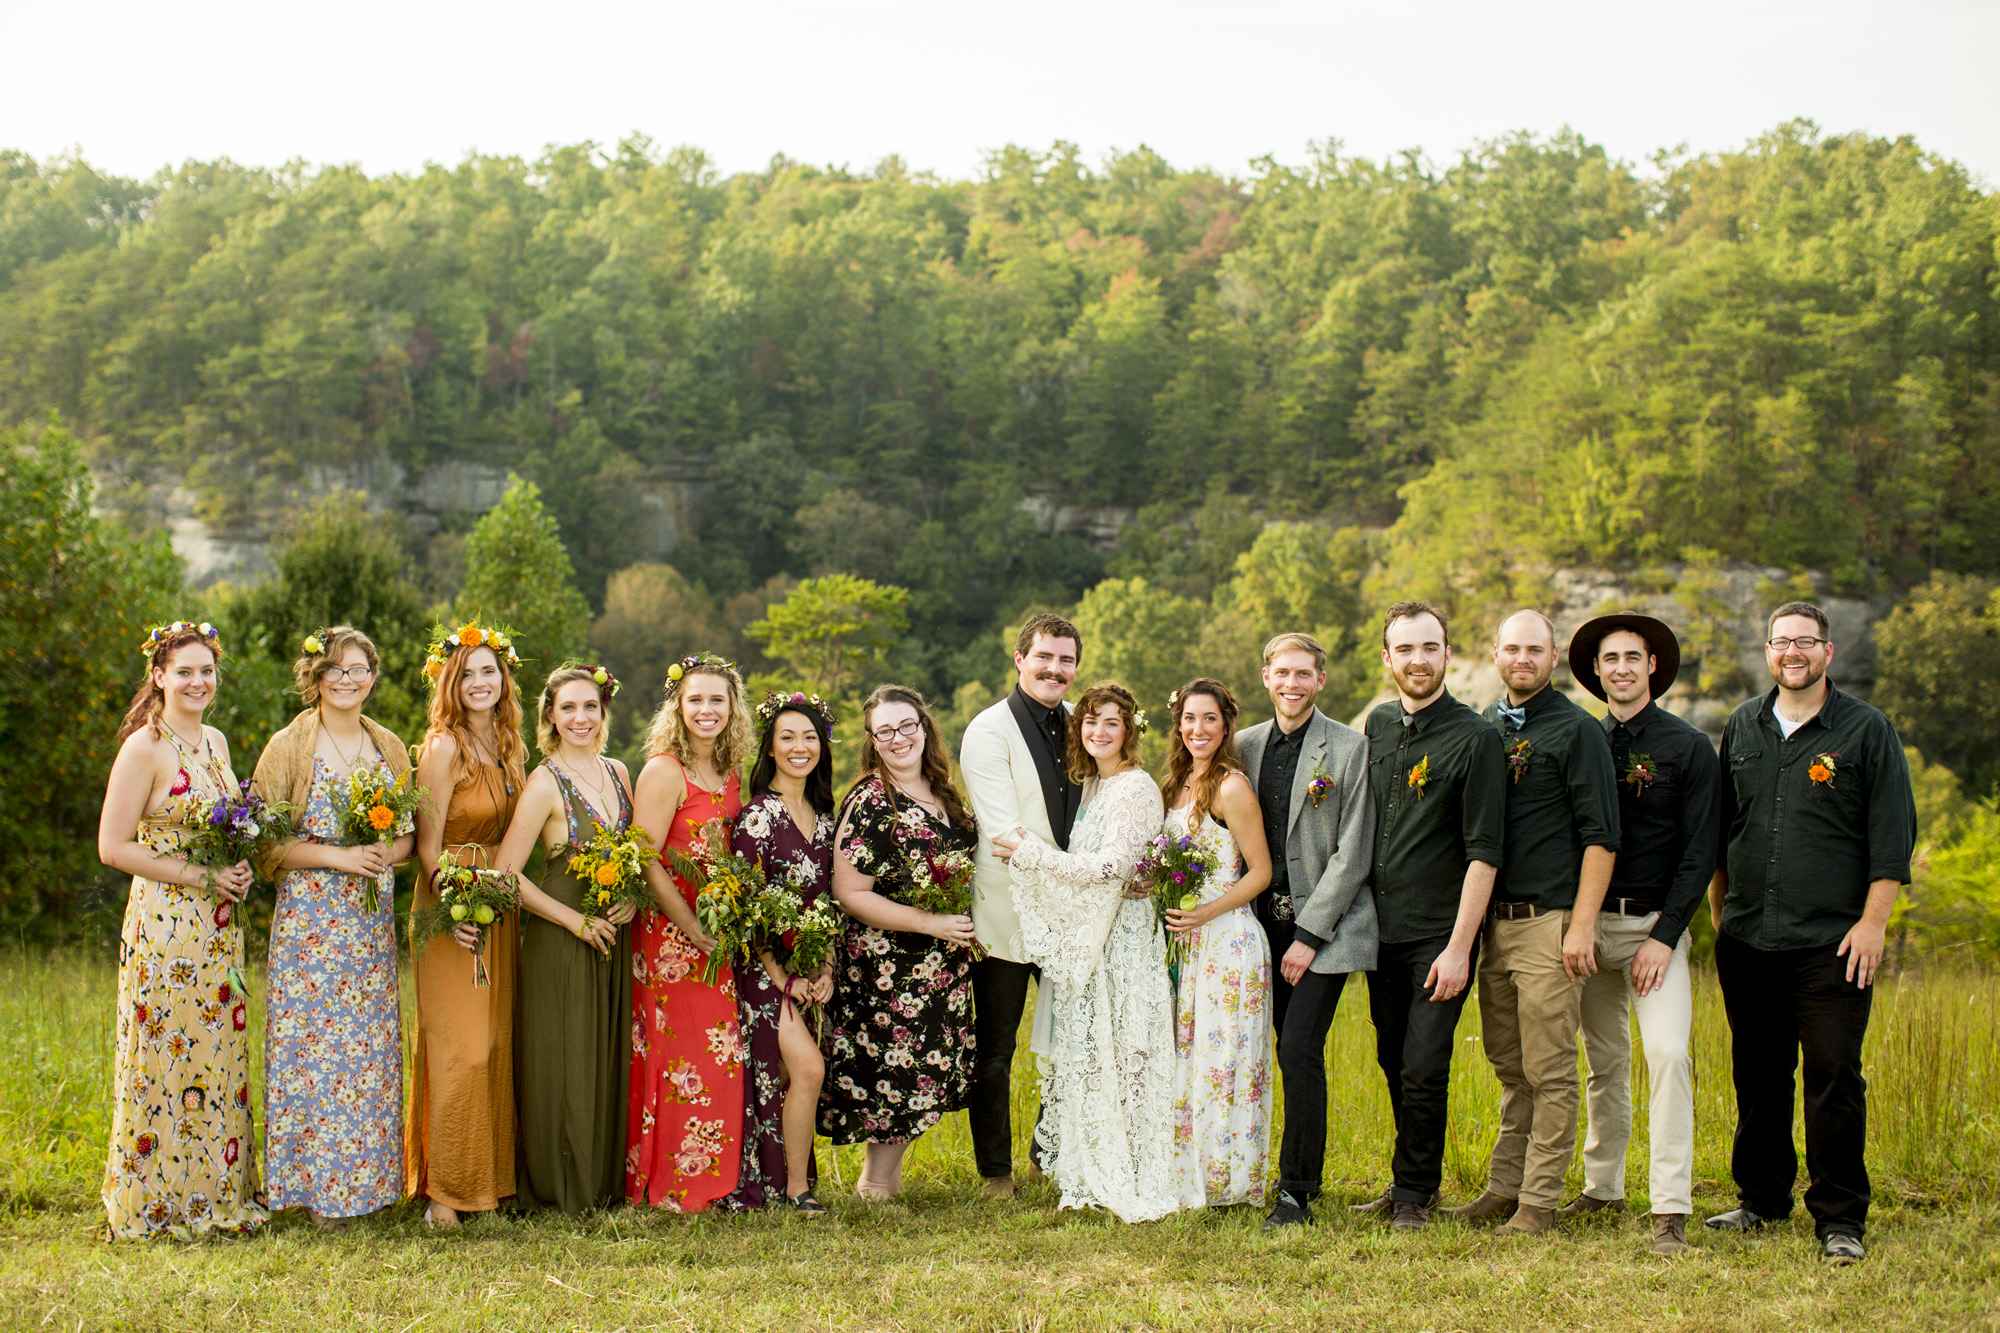 Seriously_Sabrina_Photography_Red_River_Gorge_Kentucky_Wedding_ShawnDana148.jpg